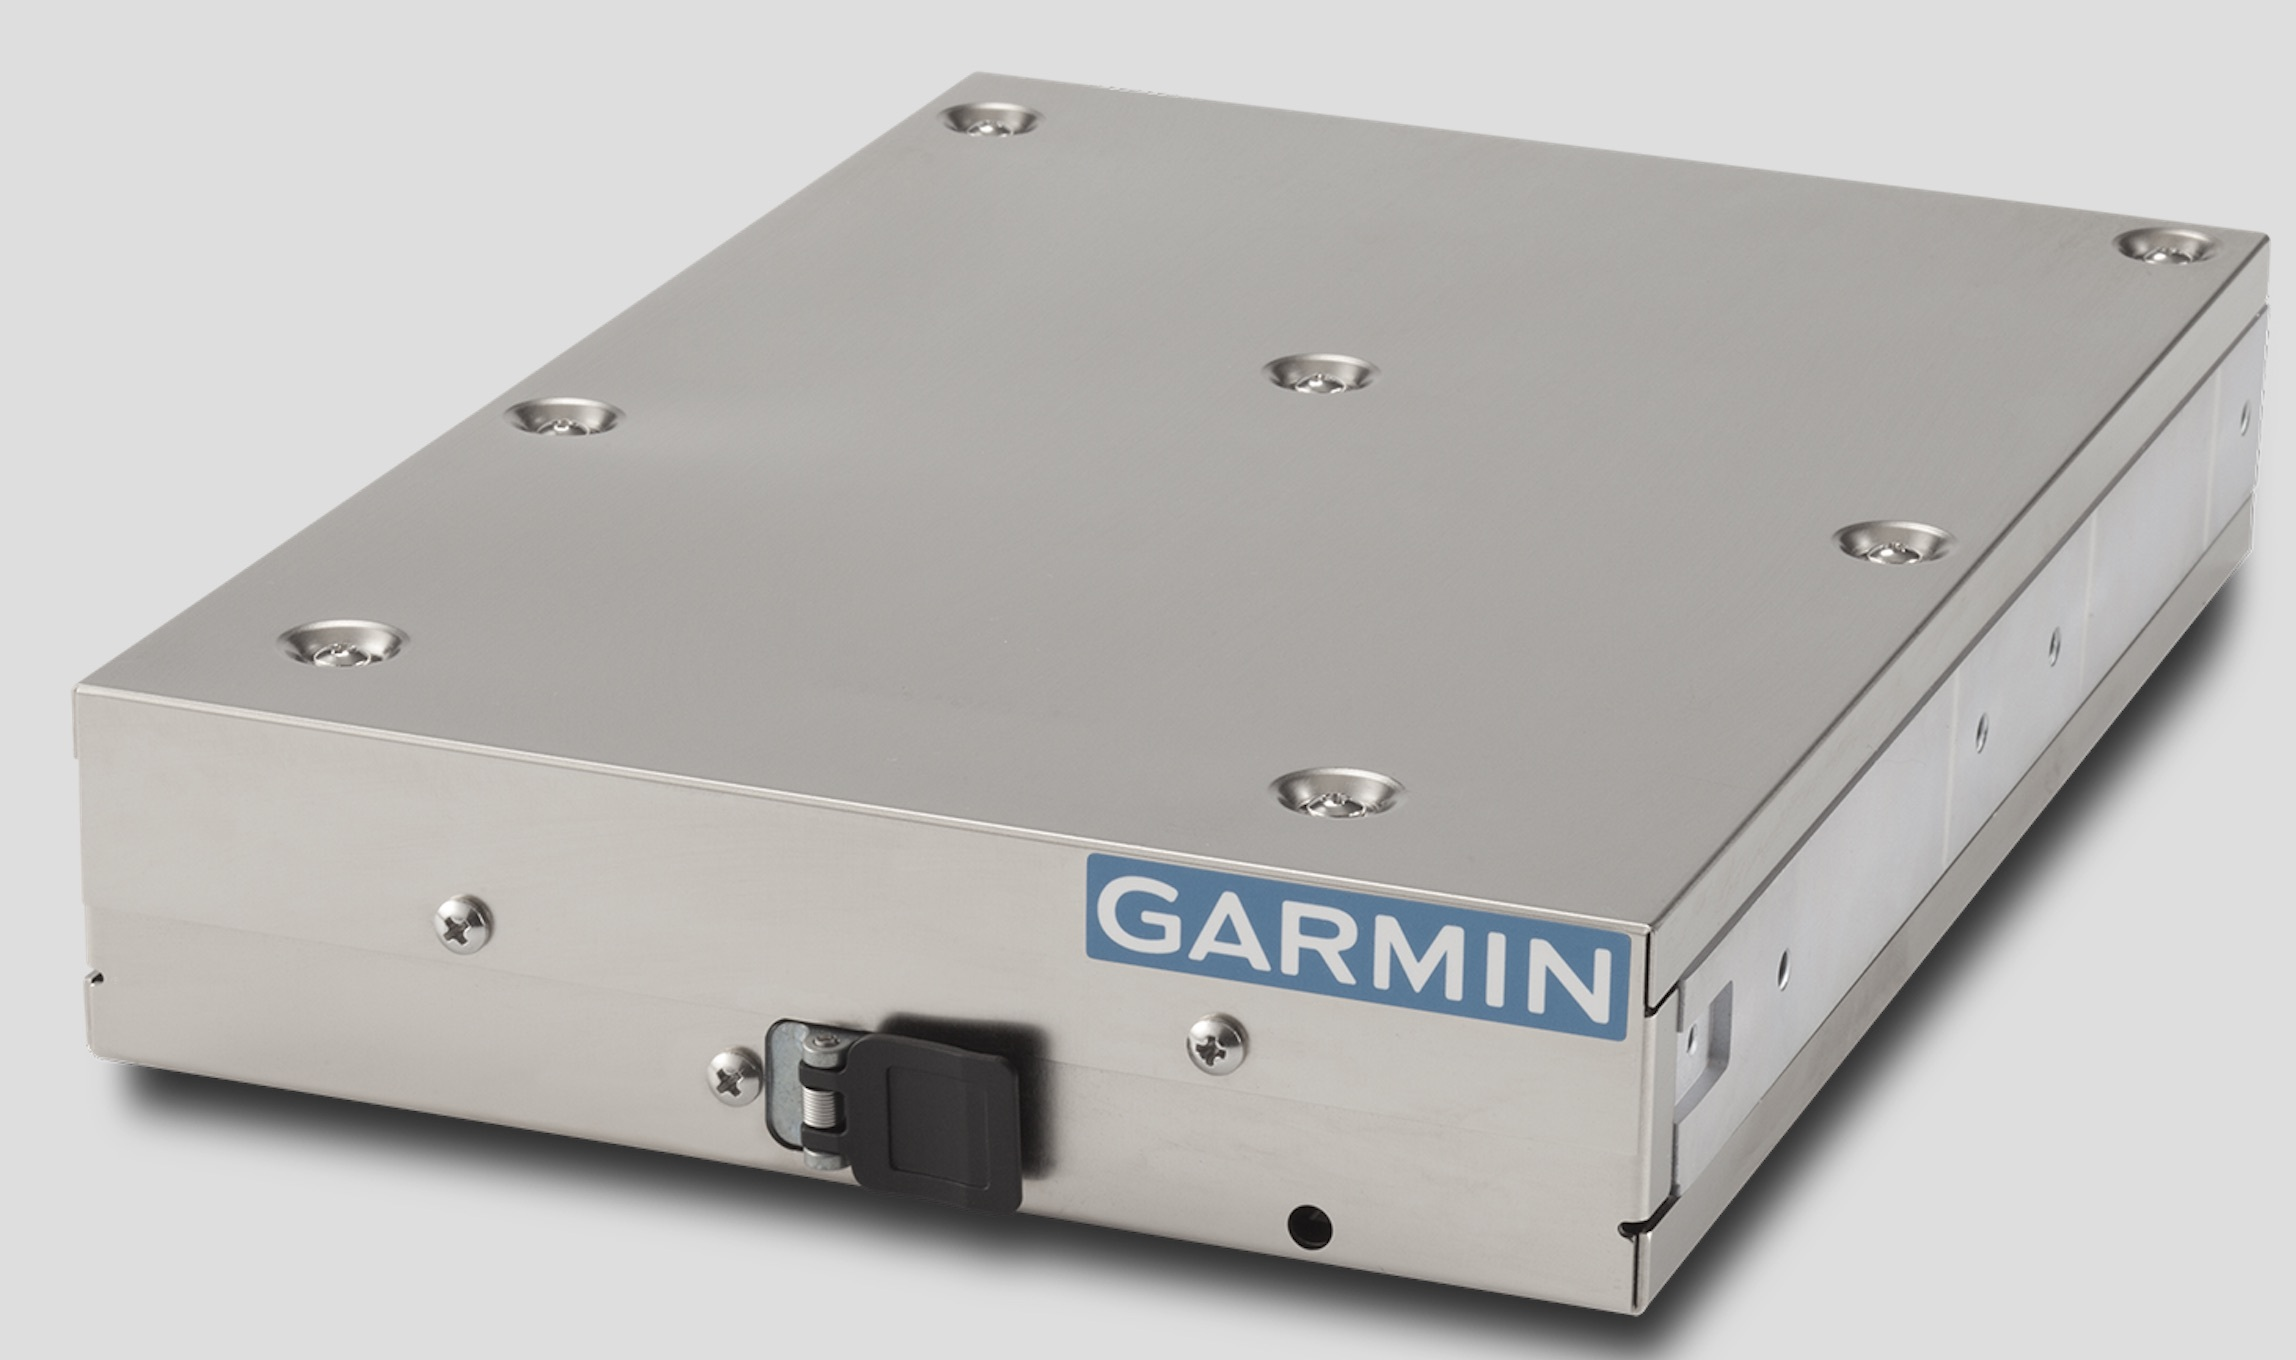 Garmin® Team X introduces the GTX 45R and GTX 35R ADS-B transponders ...